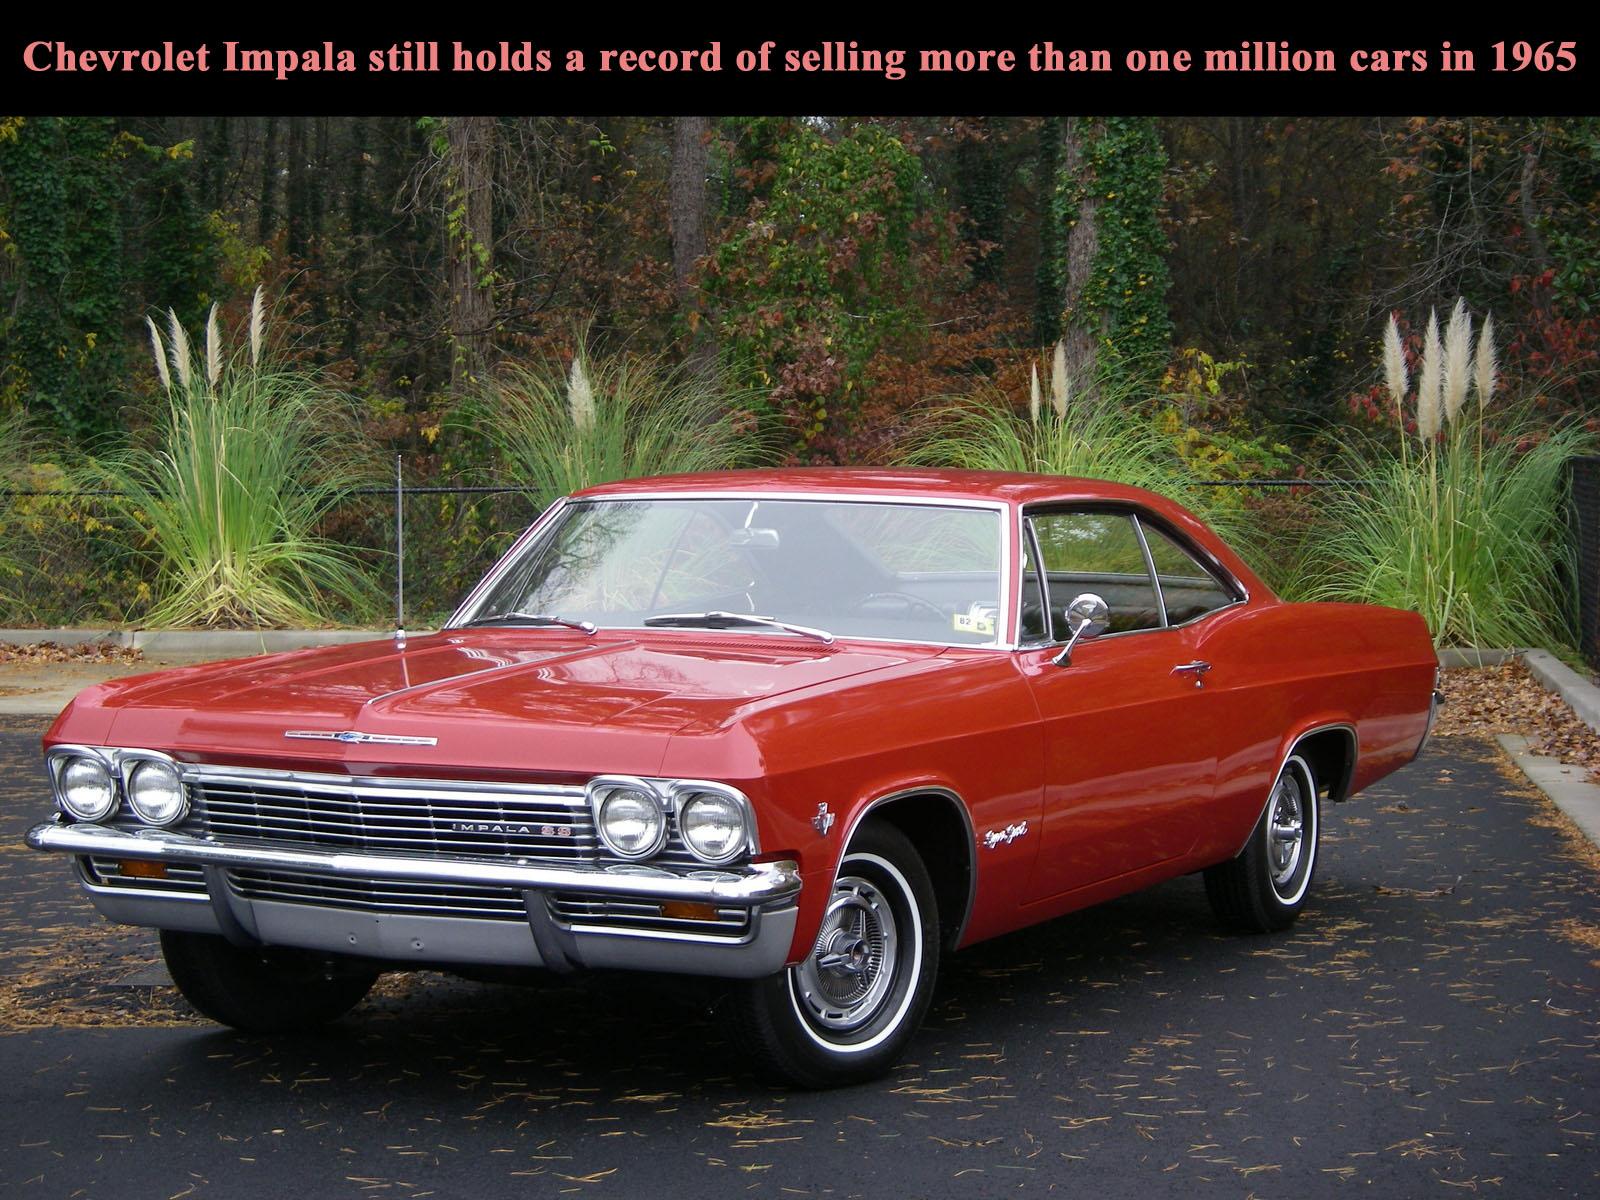 chevrolet, chevy impala, chevy red